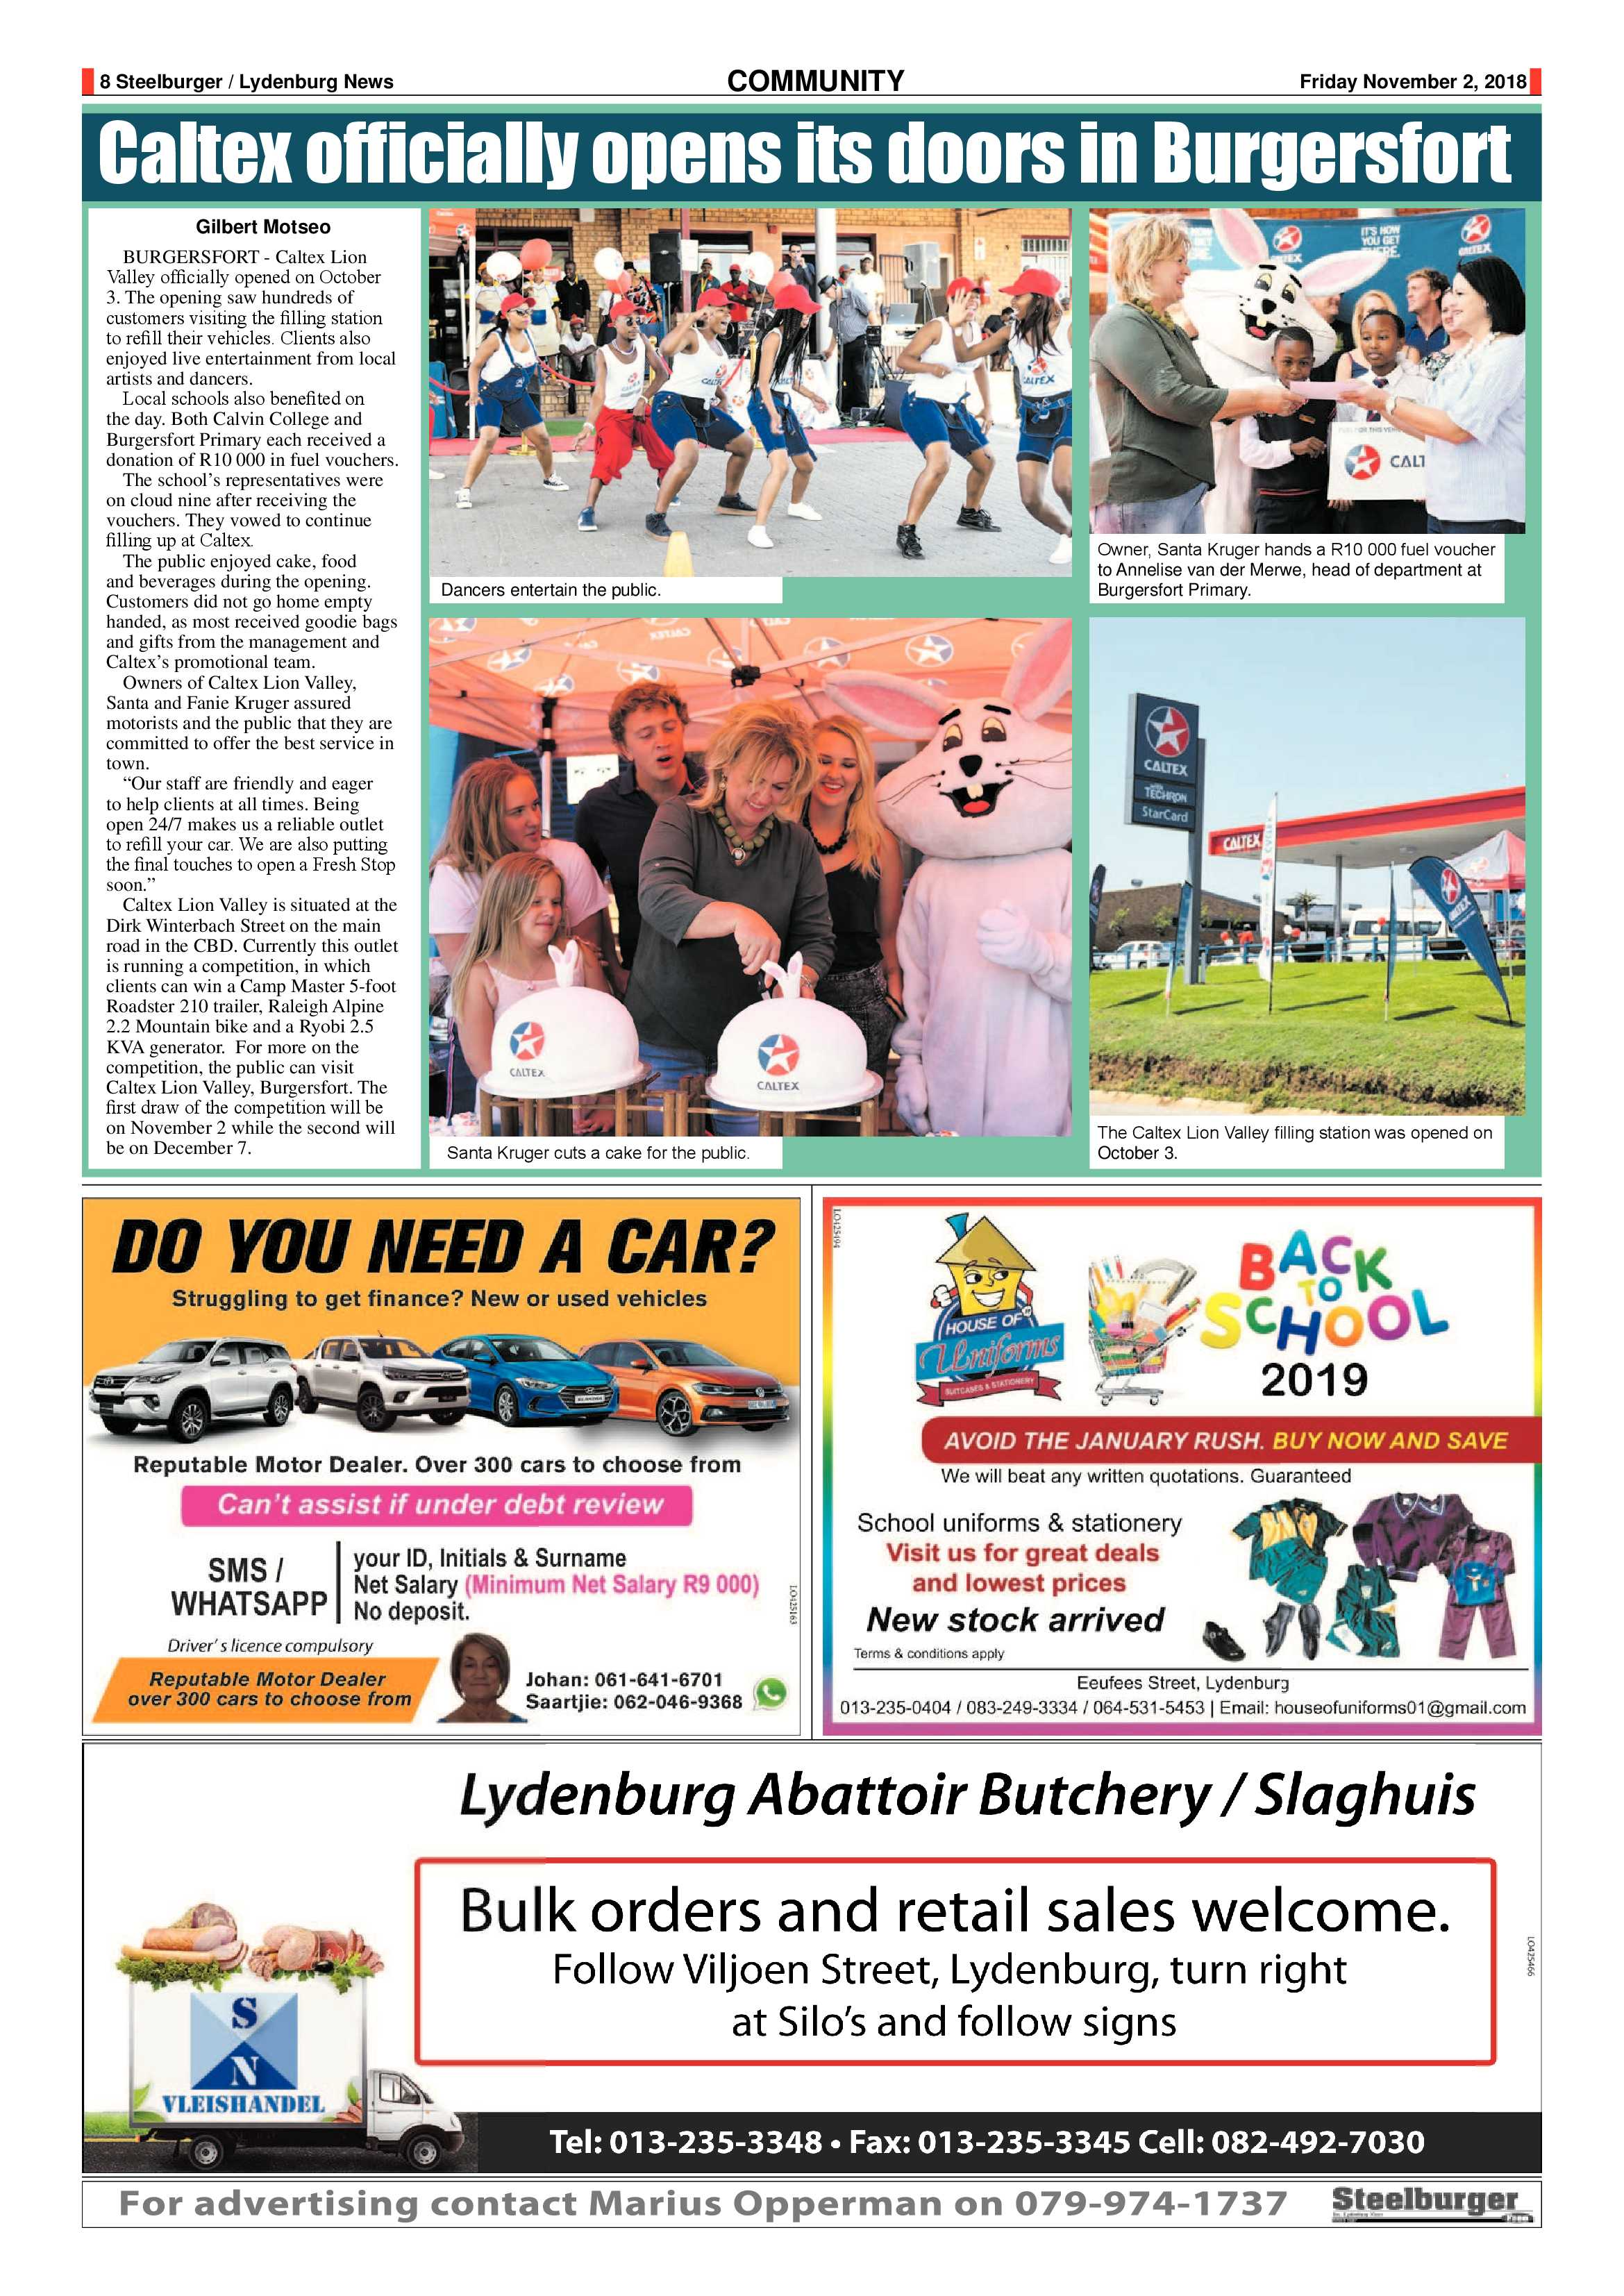 steelburger-news-2-november-2018-epapers-page-8